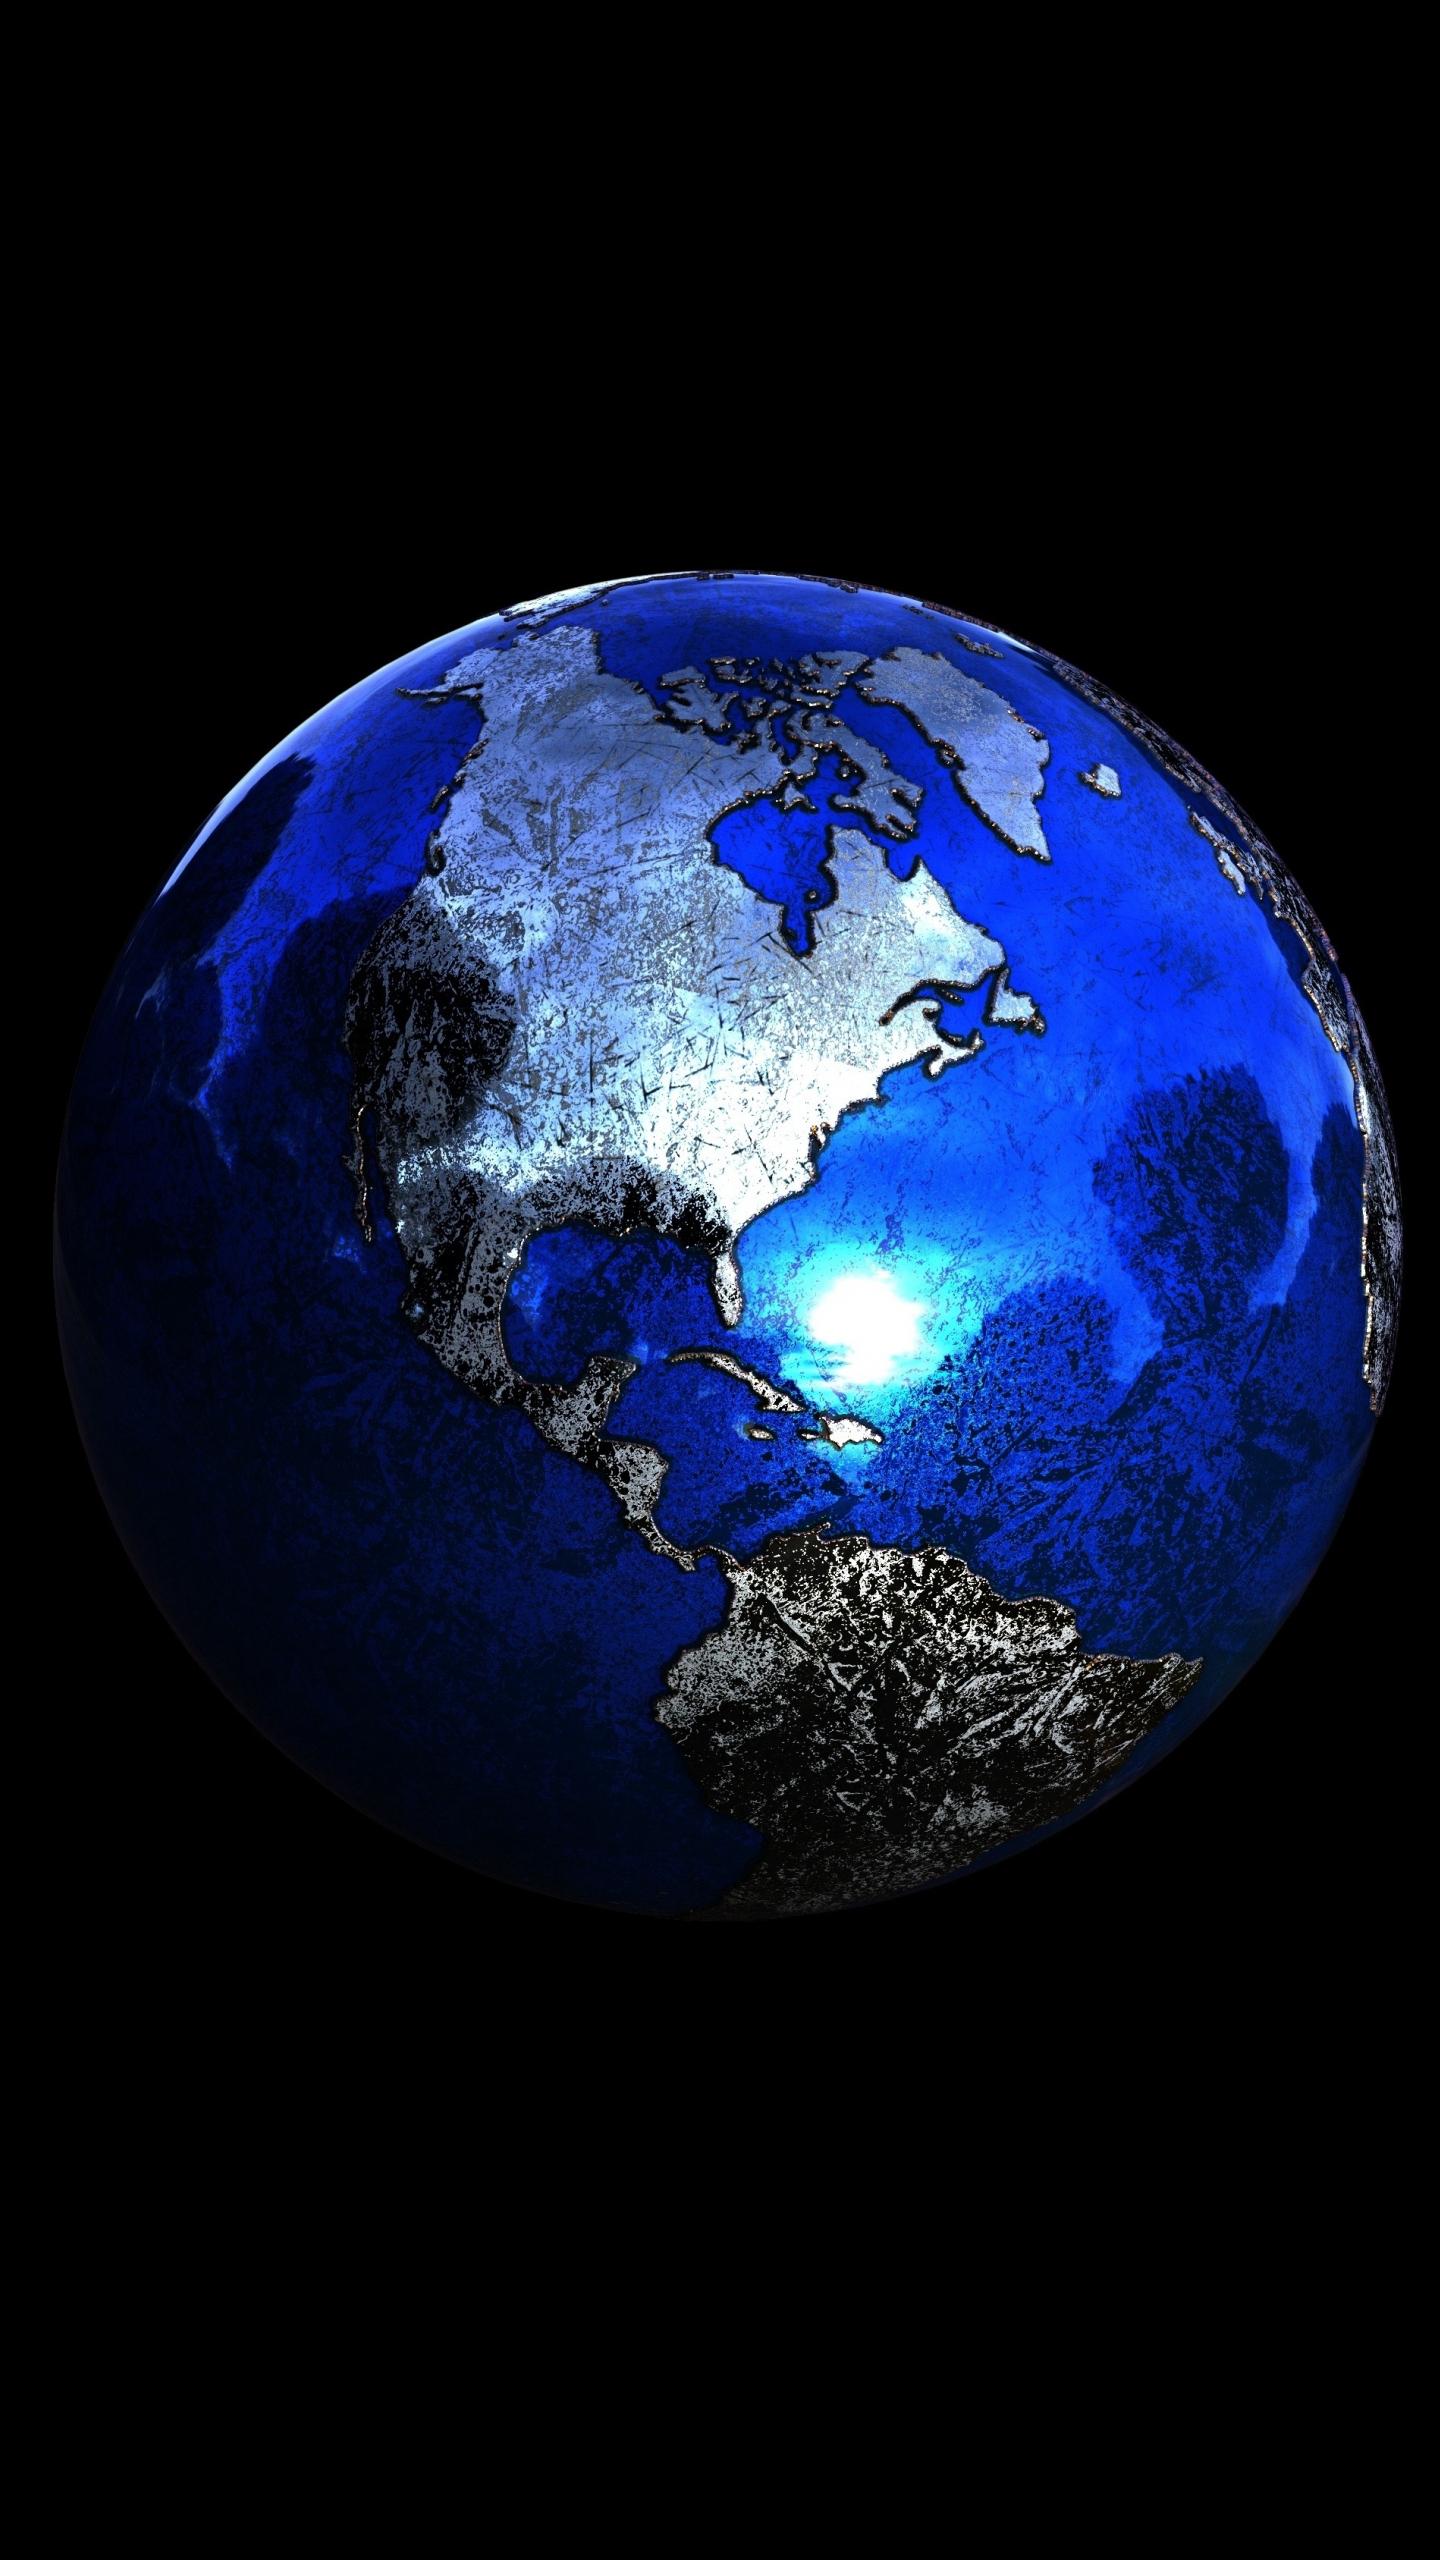 Download 1440x2560 Wallpaper Planet Earth Sphere 3d Figure